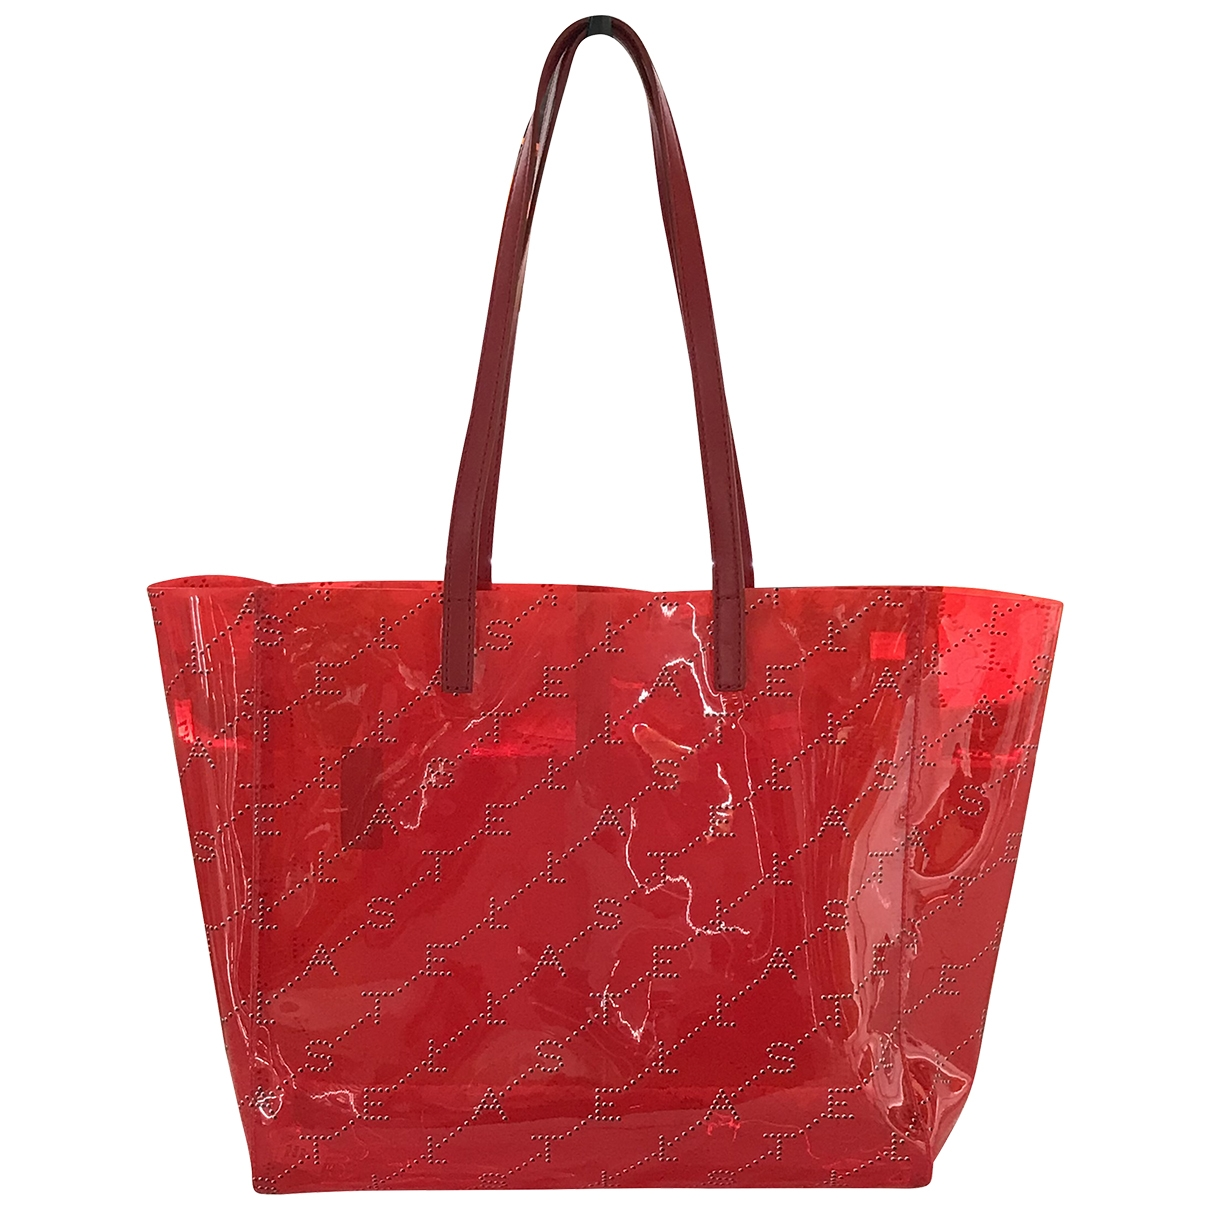 Stella Mccartney \N Red handbag for Women \N